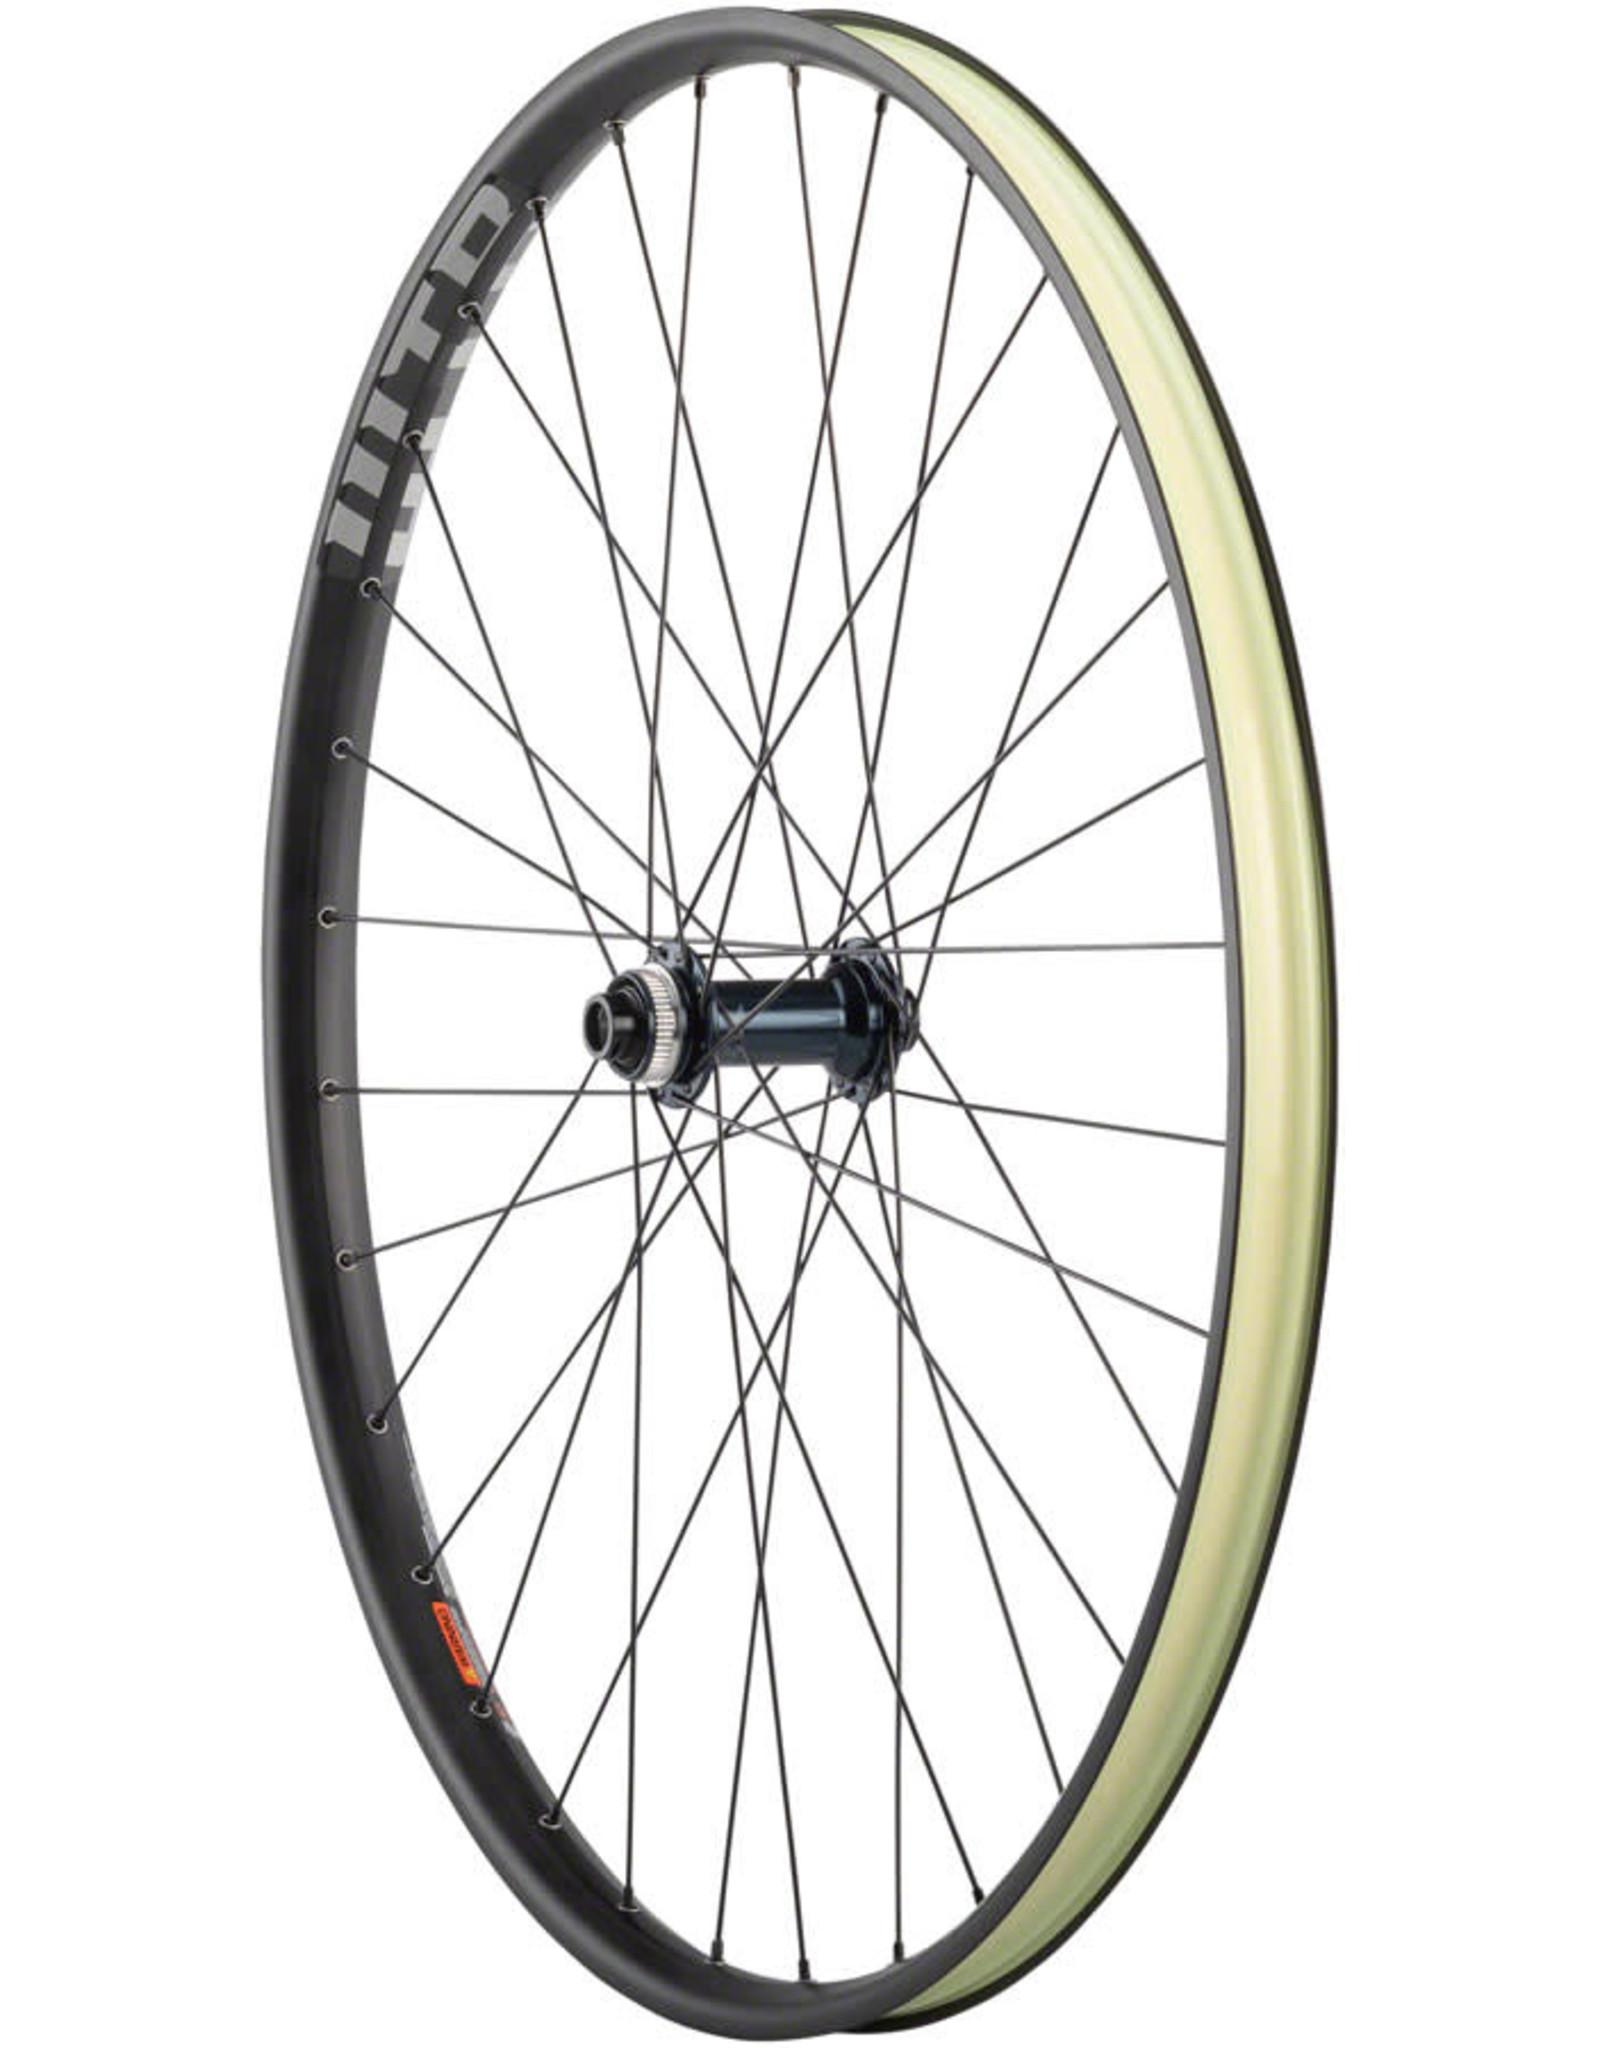 "Quality Wheels Quality Wheels SLX/WTB ST Light i29 Front Wheel - 29"", 15 x 110mm Boost, Center-Lock, Black"